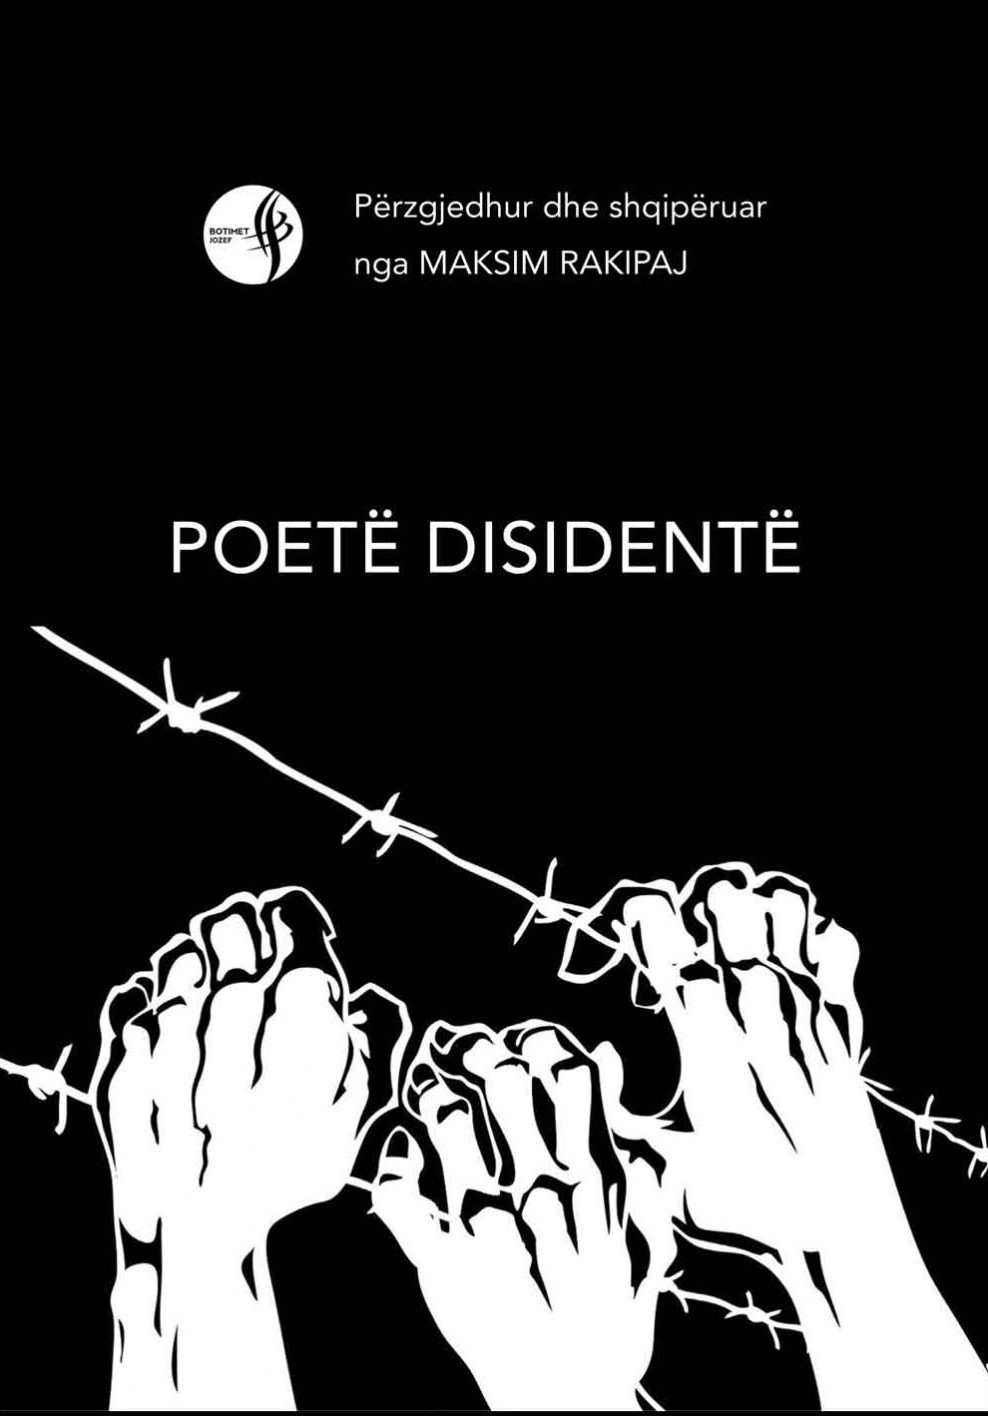 Poete disidente